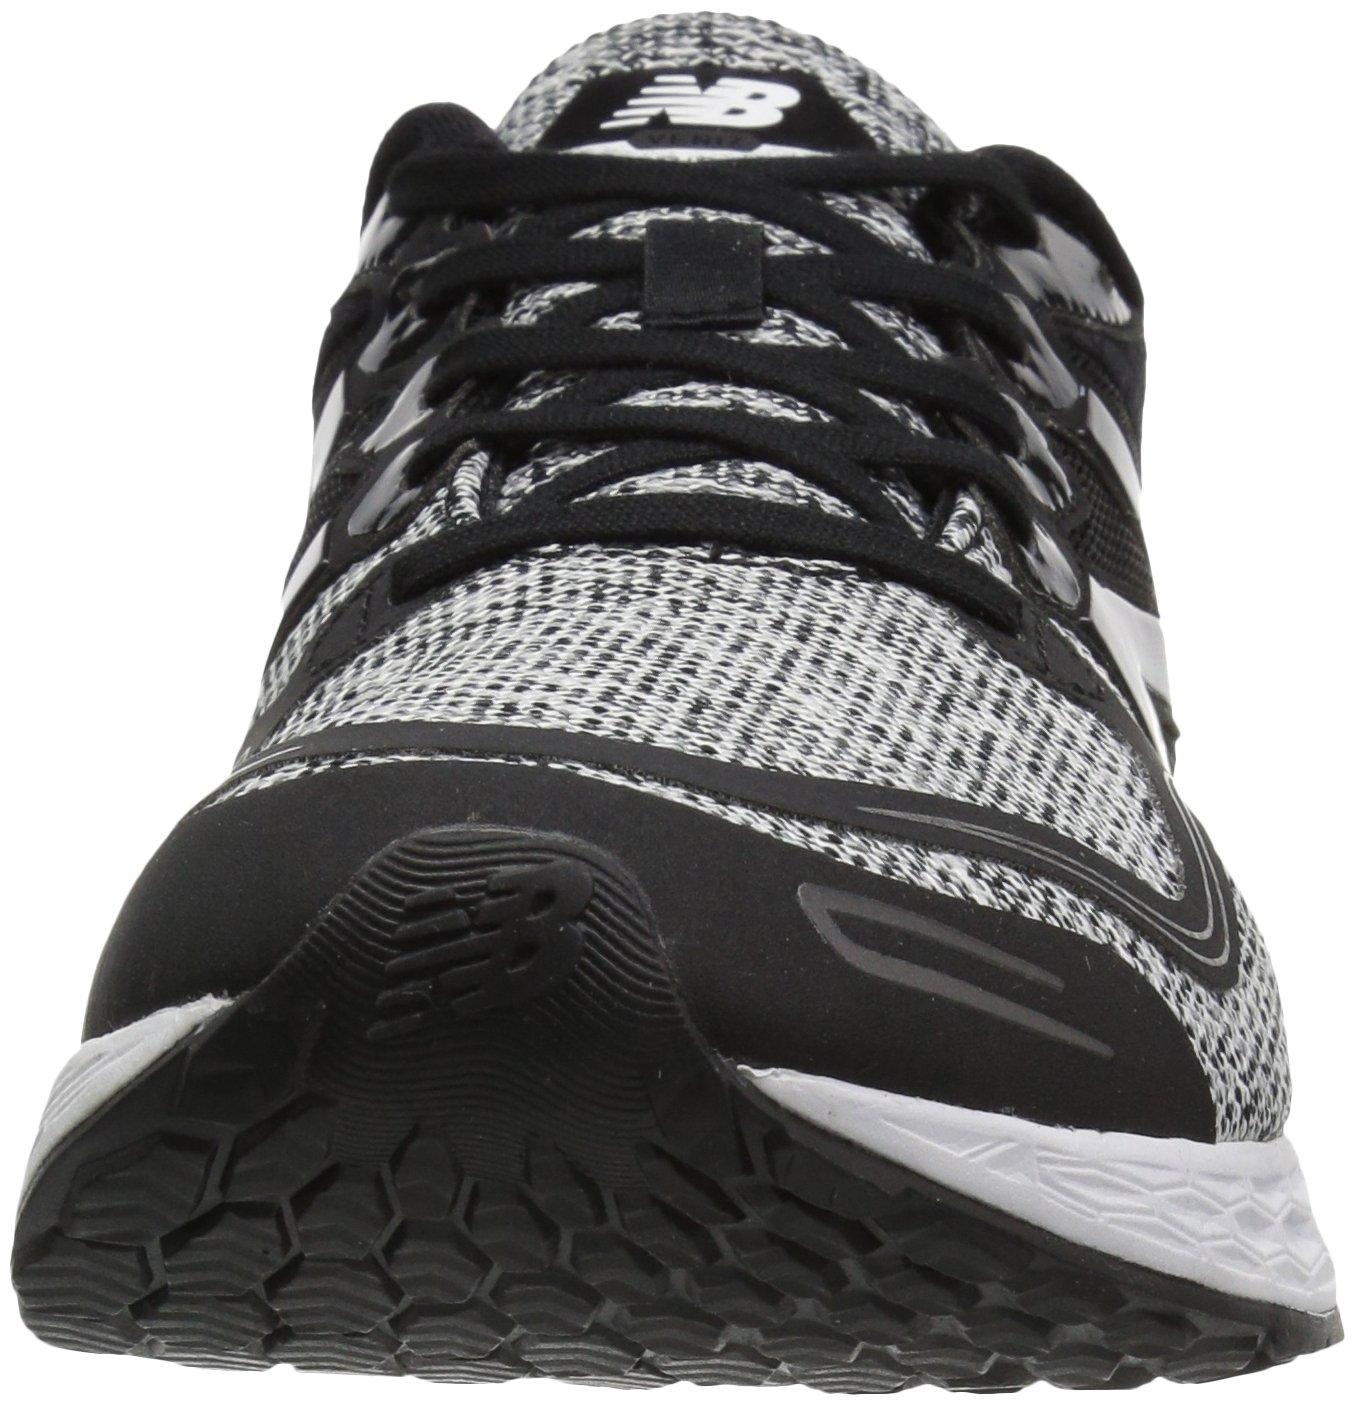 New Balance Women's Fresh Foam Veniz v1 Running US|Black/White Shoe B06XRXRDGZ 12 D US|Black/White Running f087c6